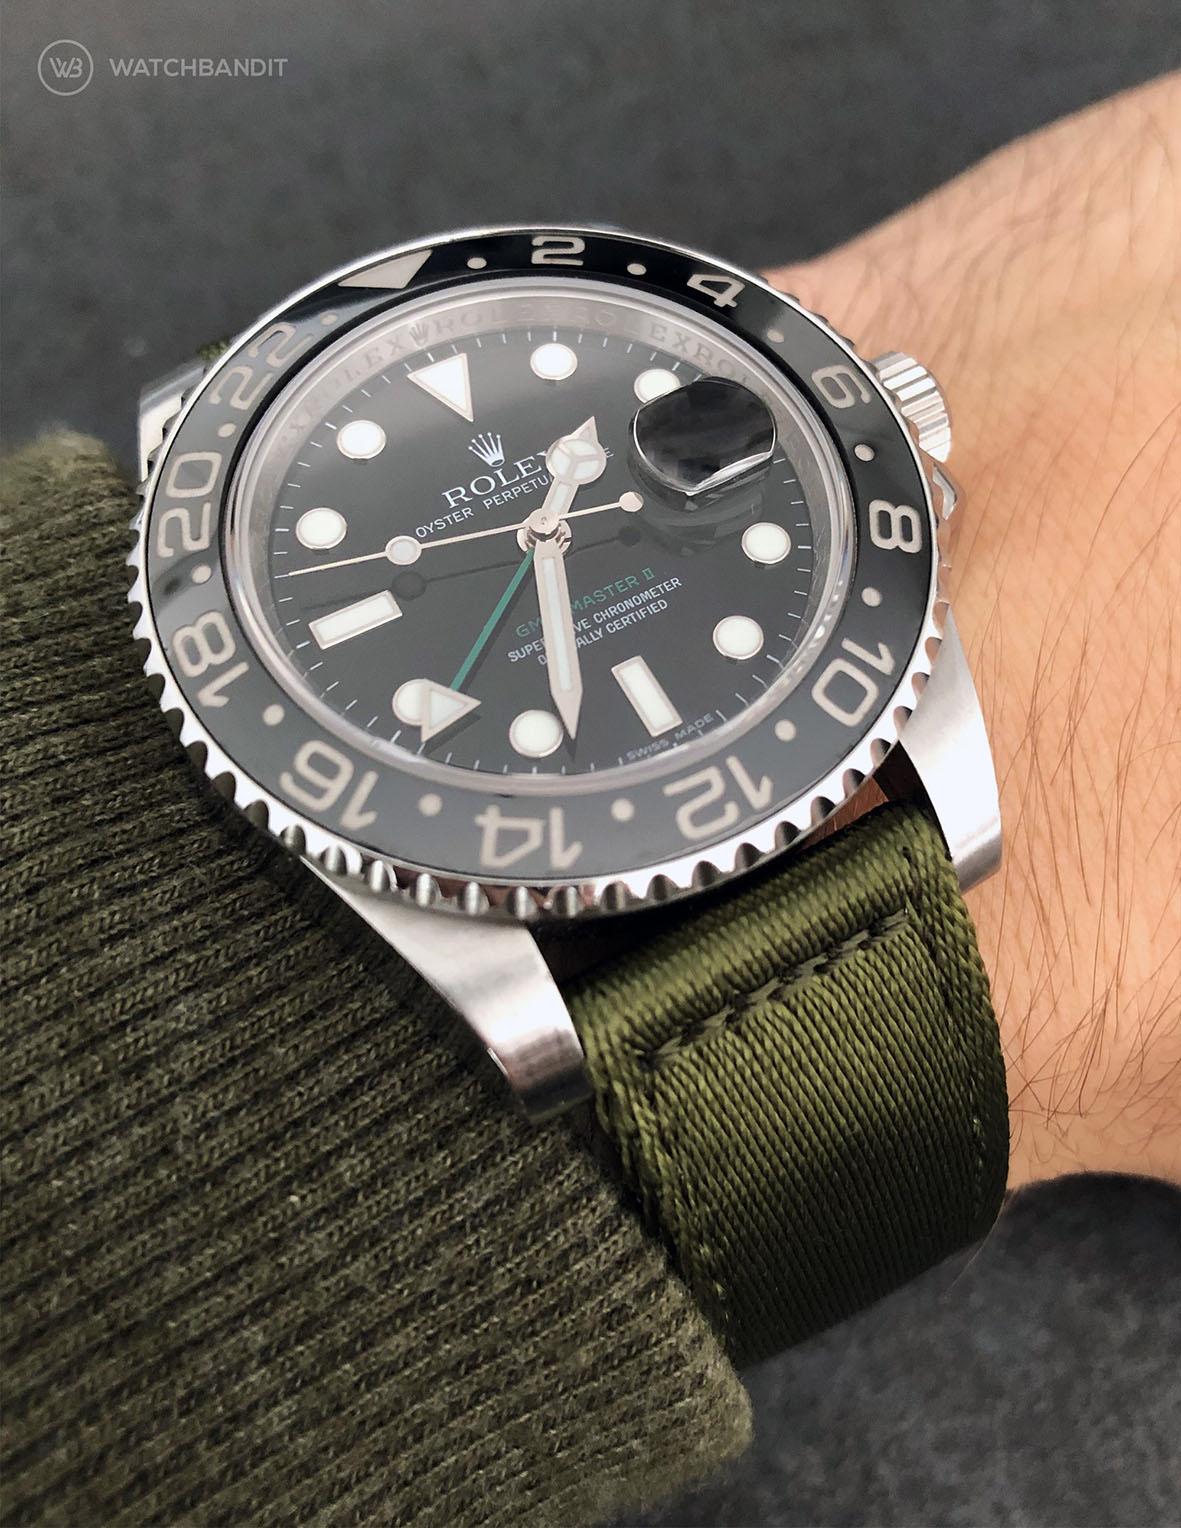 Rolex GMT Master II on green WB Original two-piece NATO by @gmtfanatic